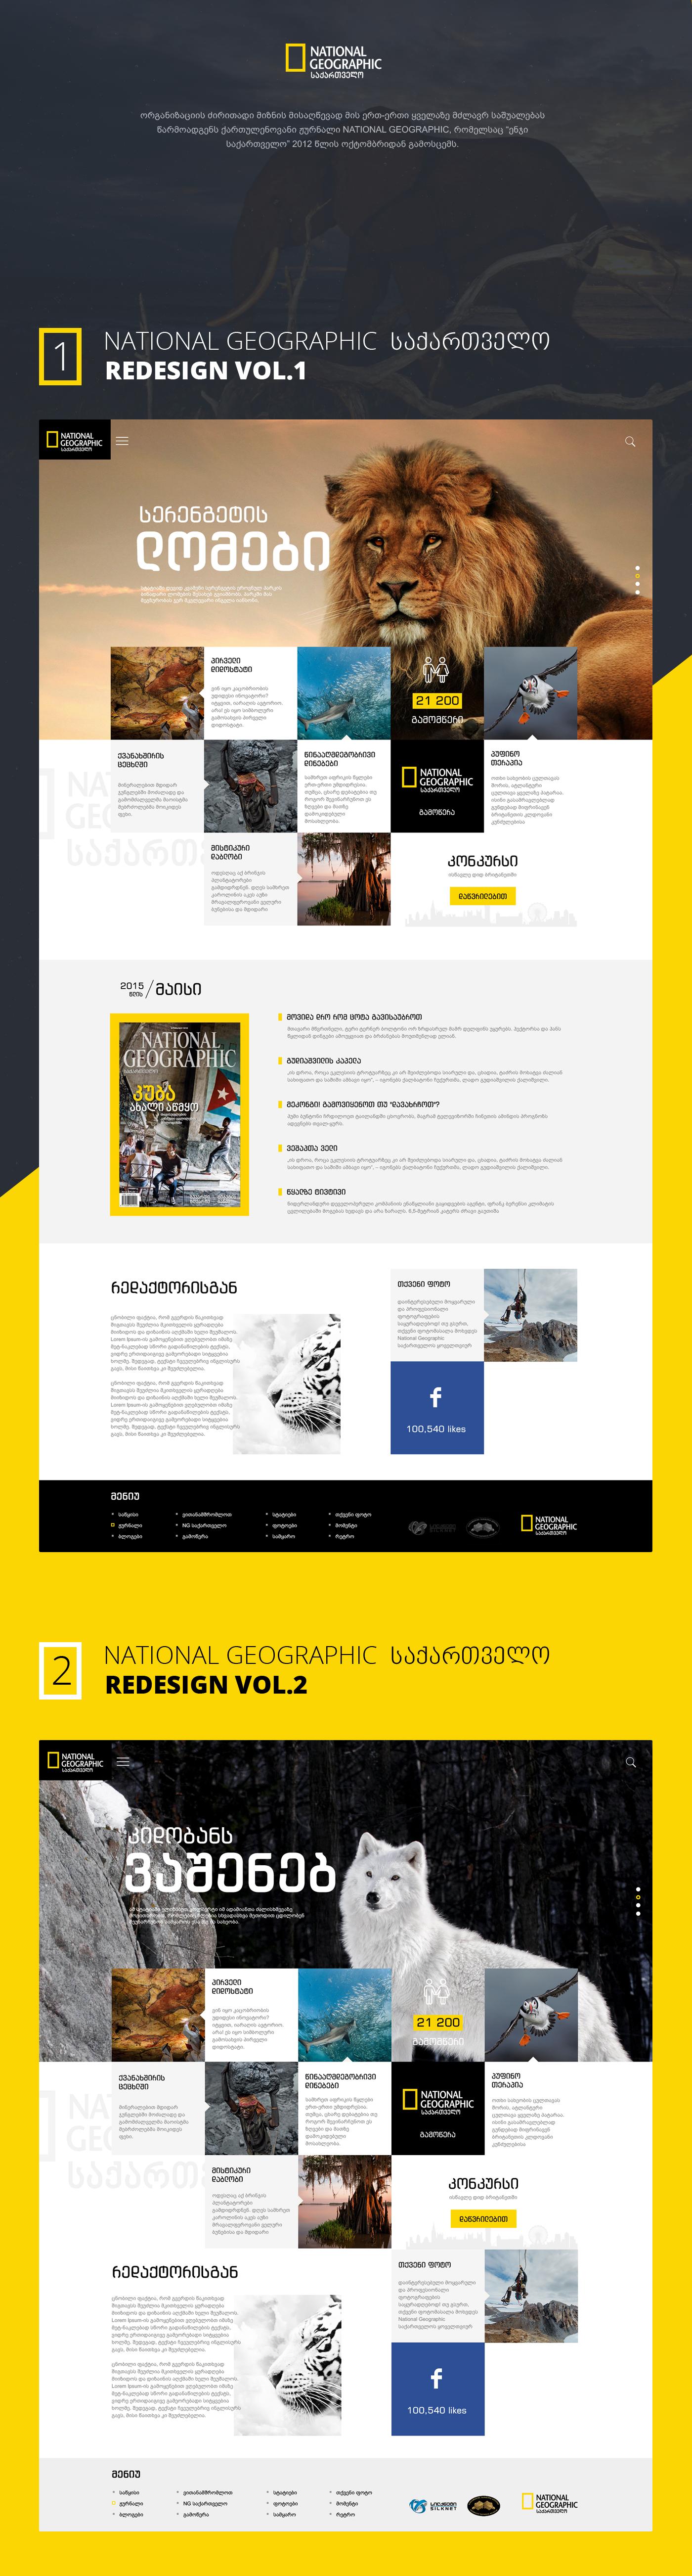 Giga Tamarasvili , talentueux Webdesigner et Designer d'interface #34